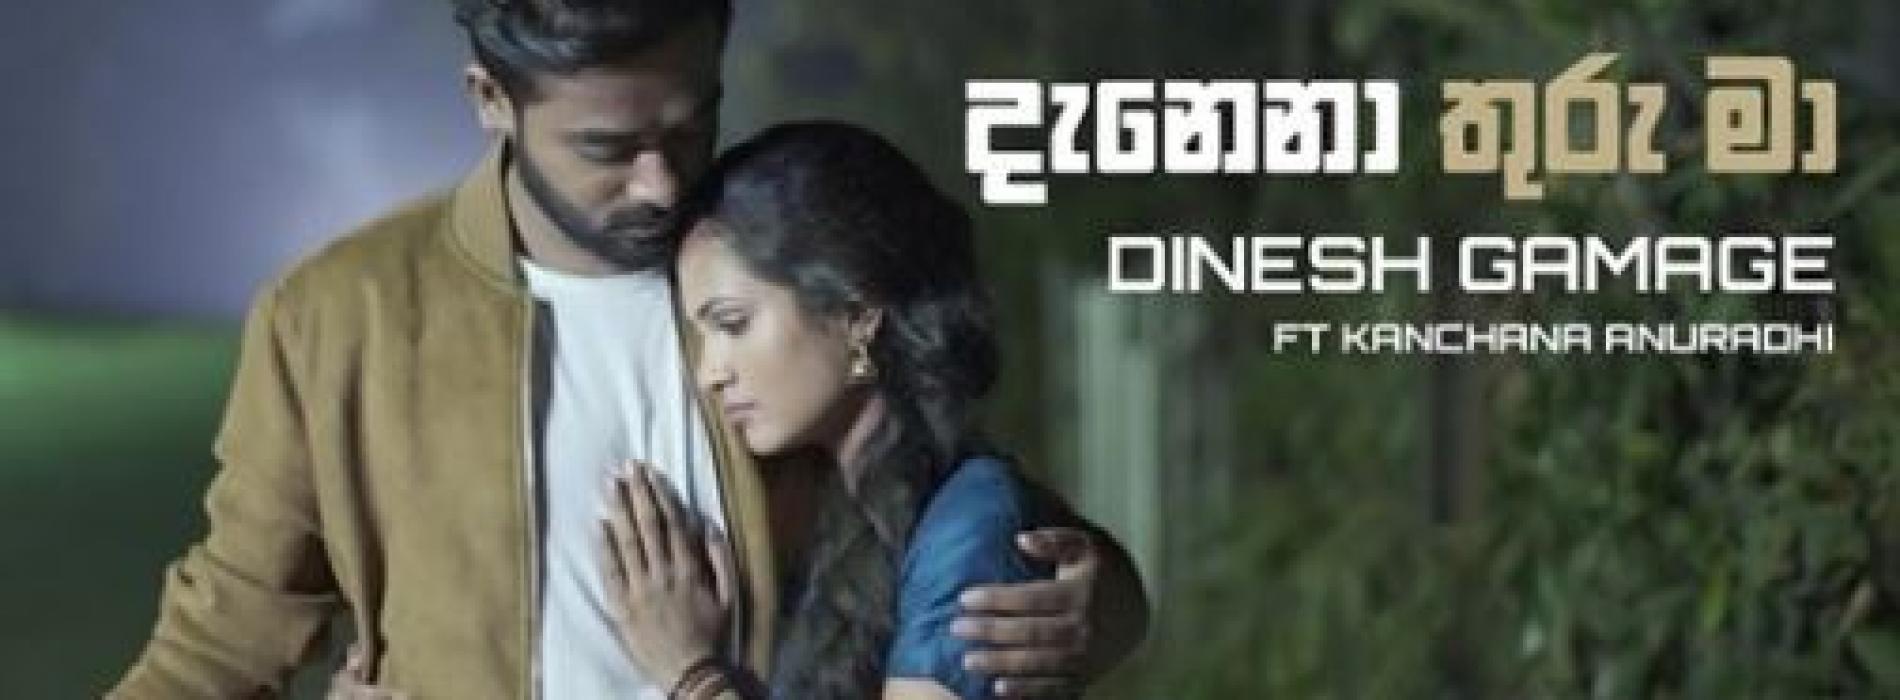 """Danena Thuru Maa(දැනෙනා තුරු මා)"" – Dinesh Gamage ft Kanchana Anuradhi (Official Music Video  2020)"